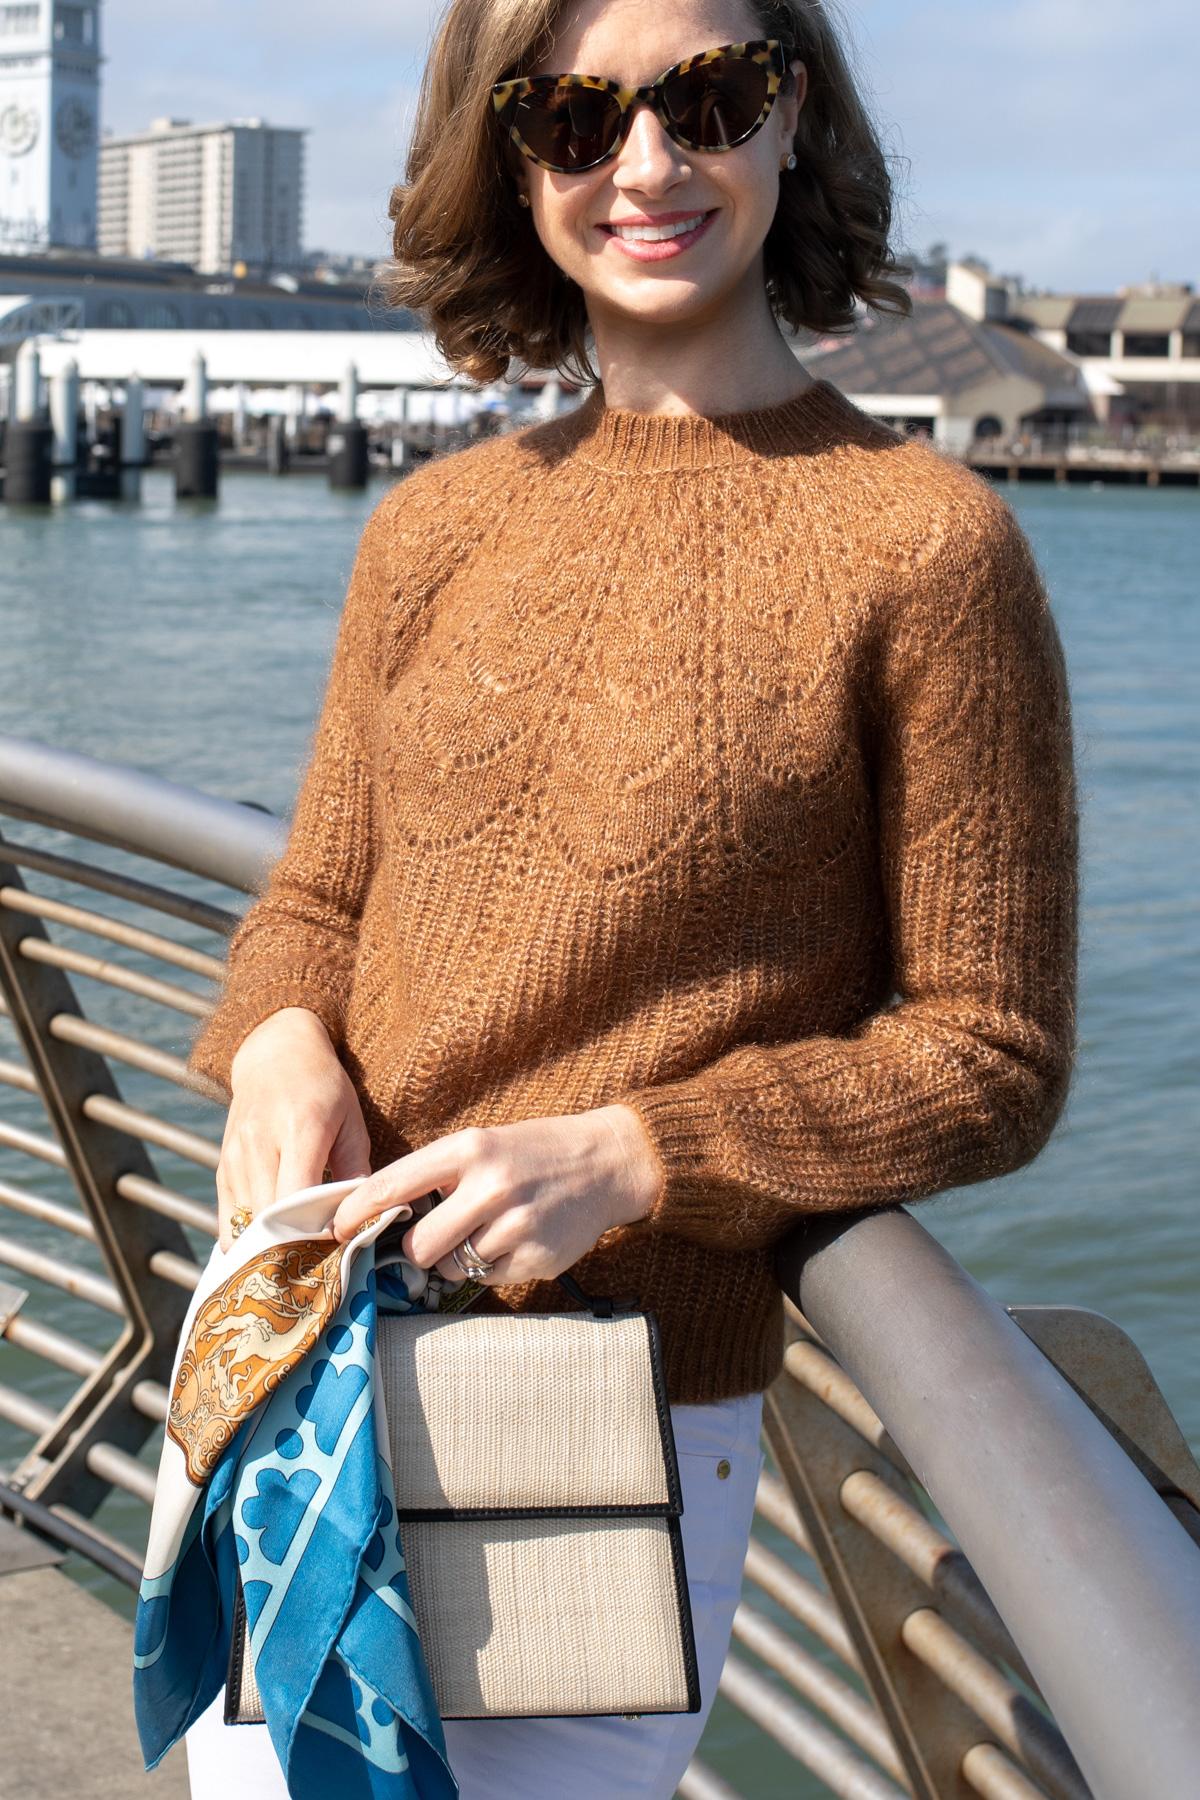 Stacie Flinner Sezane Sweater Camel Outfit -5.jpg